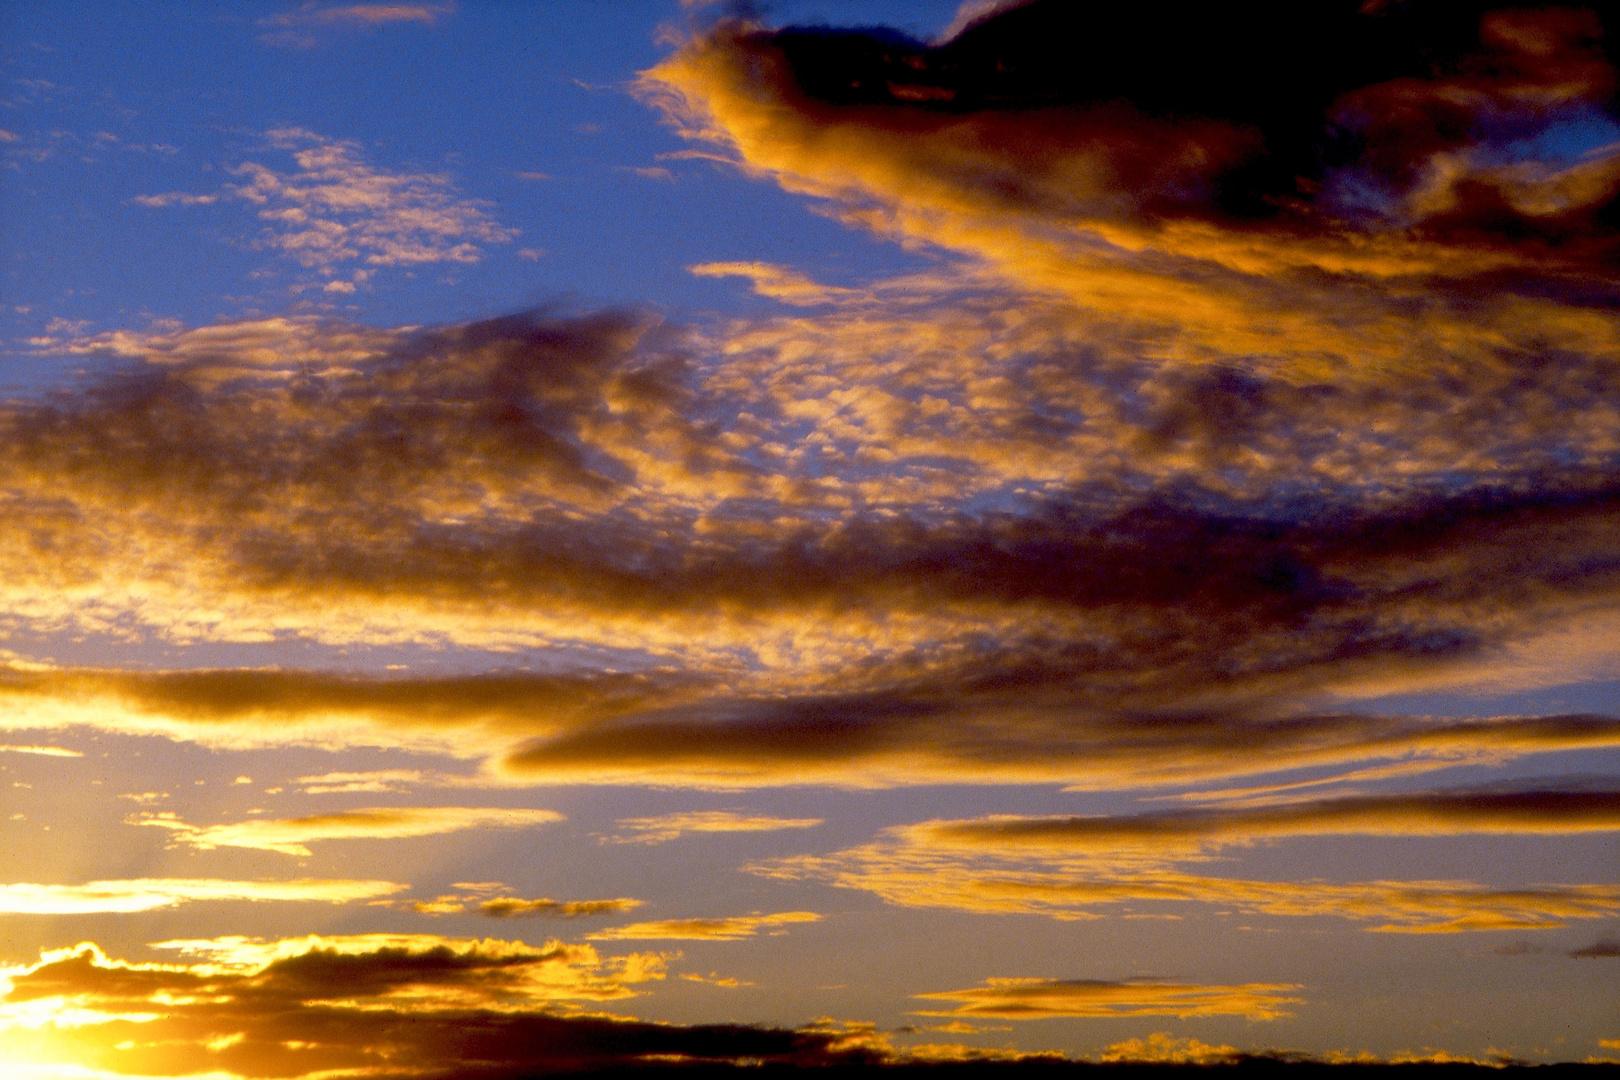 Sonnenuntergang in Feuerland